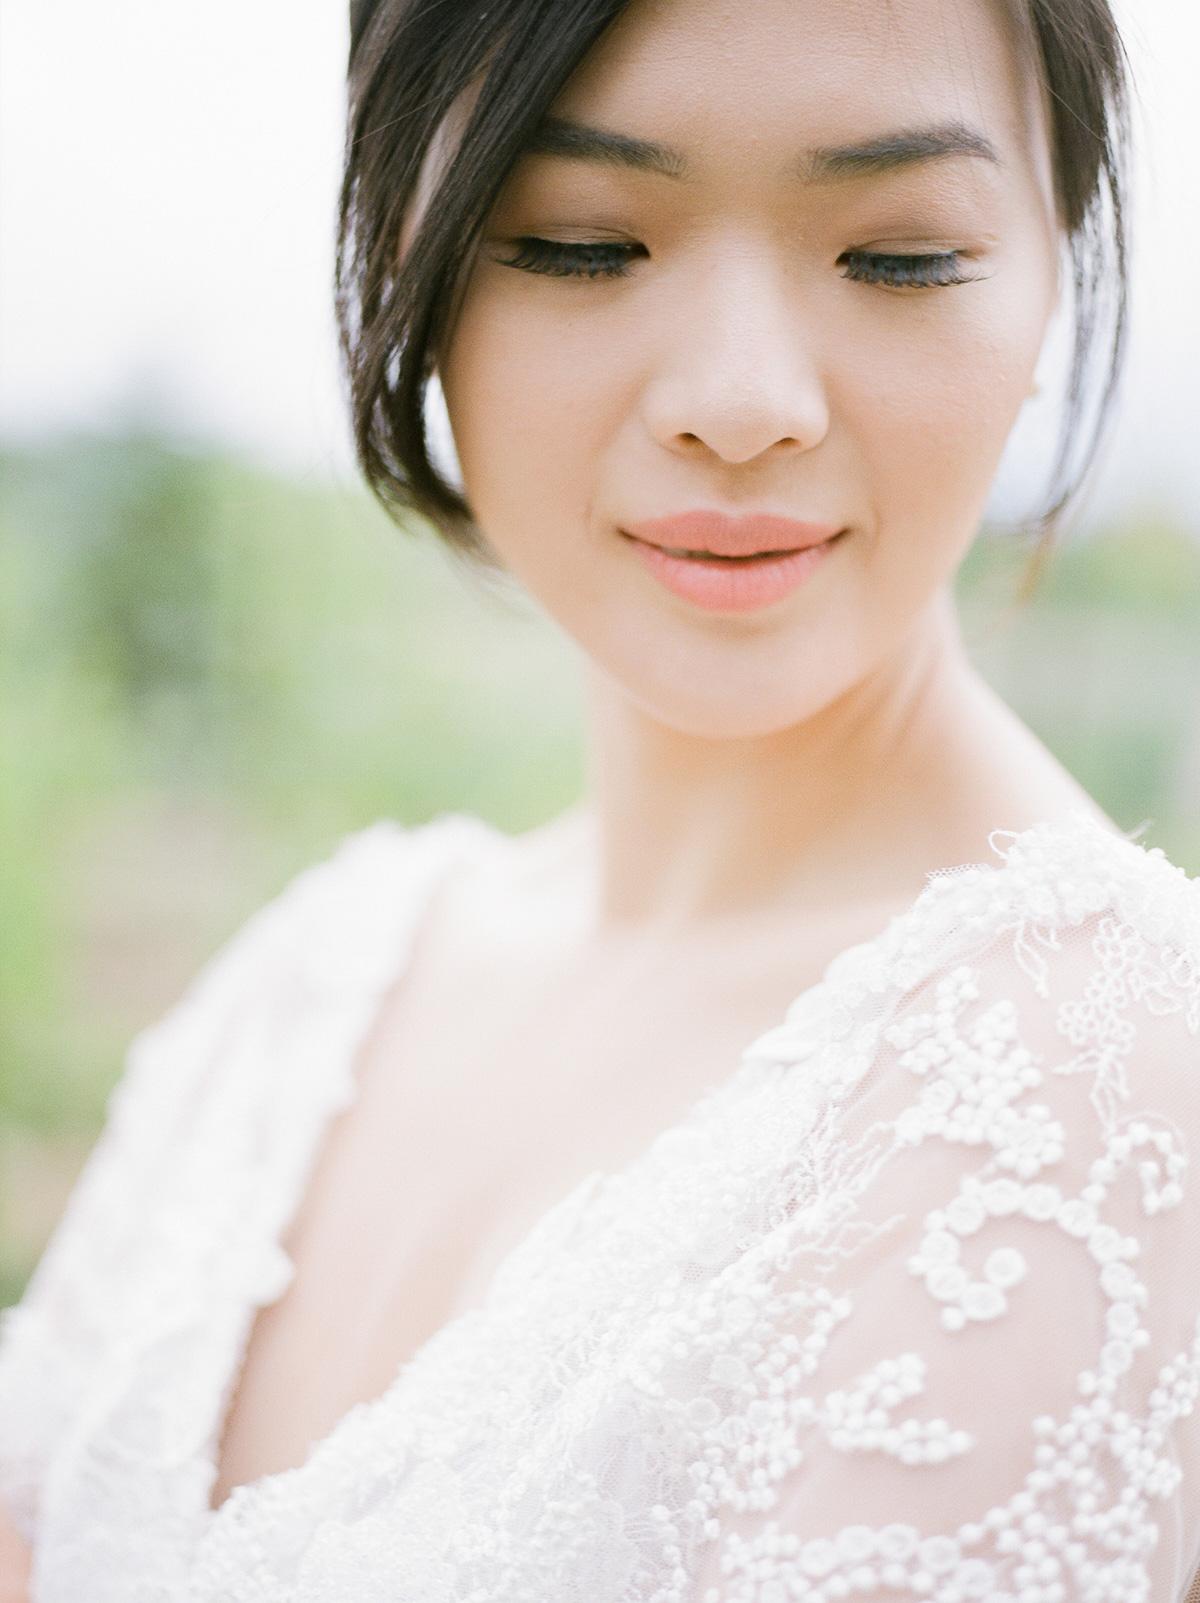 jennifer-xu-photography-vineyard-bride-swish-list-rosewod-eatstes-winery-beamsville-wedding-editorial-14.jpg